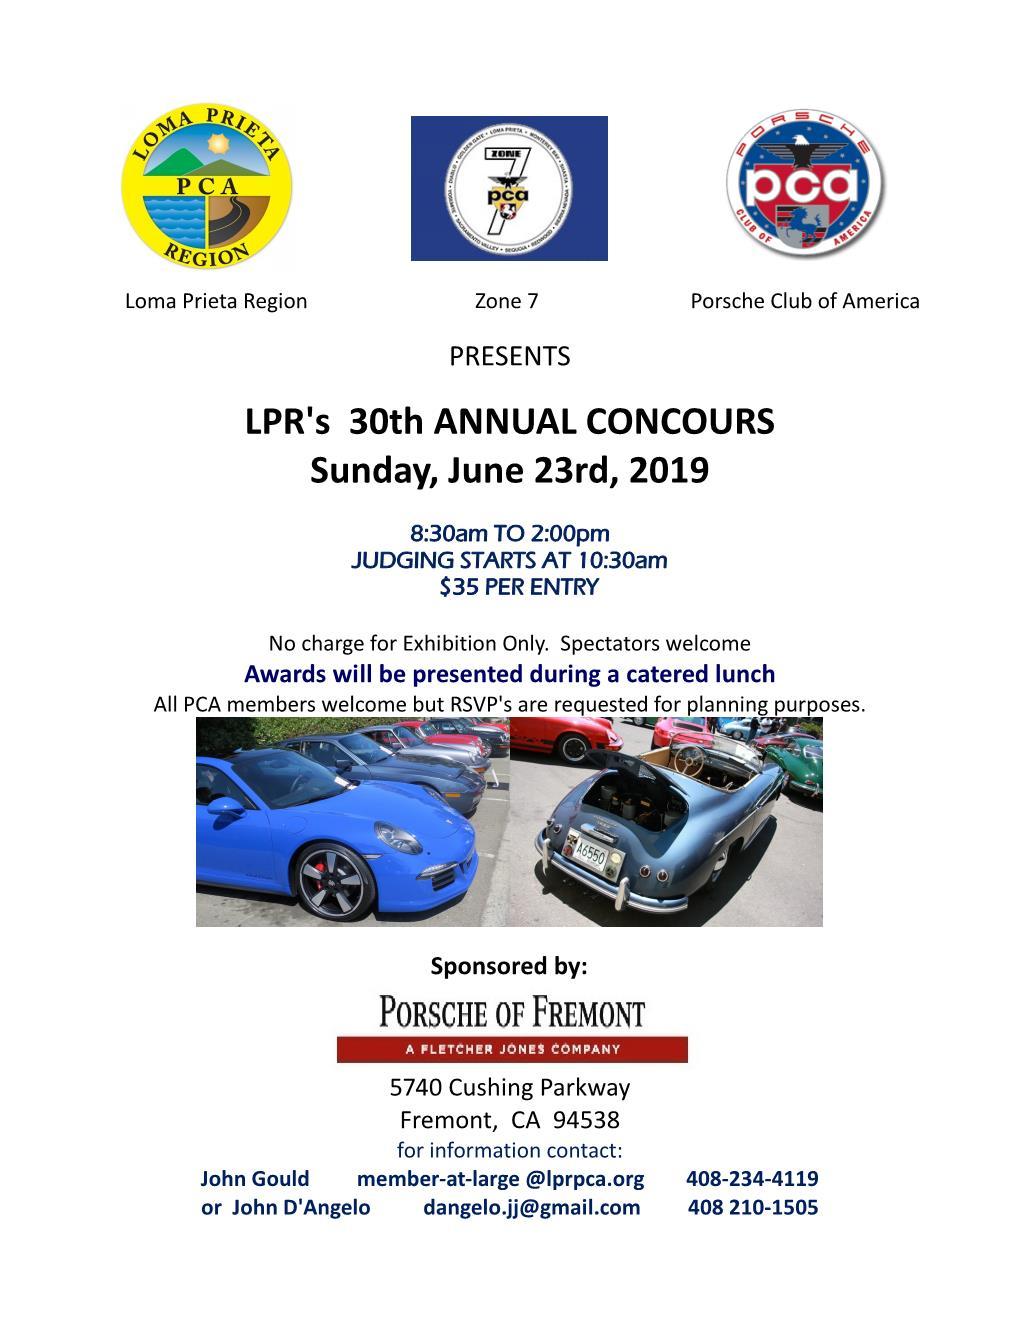 Loma Prieta Region & Zone 7 Concours @ Porsche of Fremont